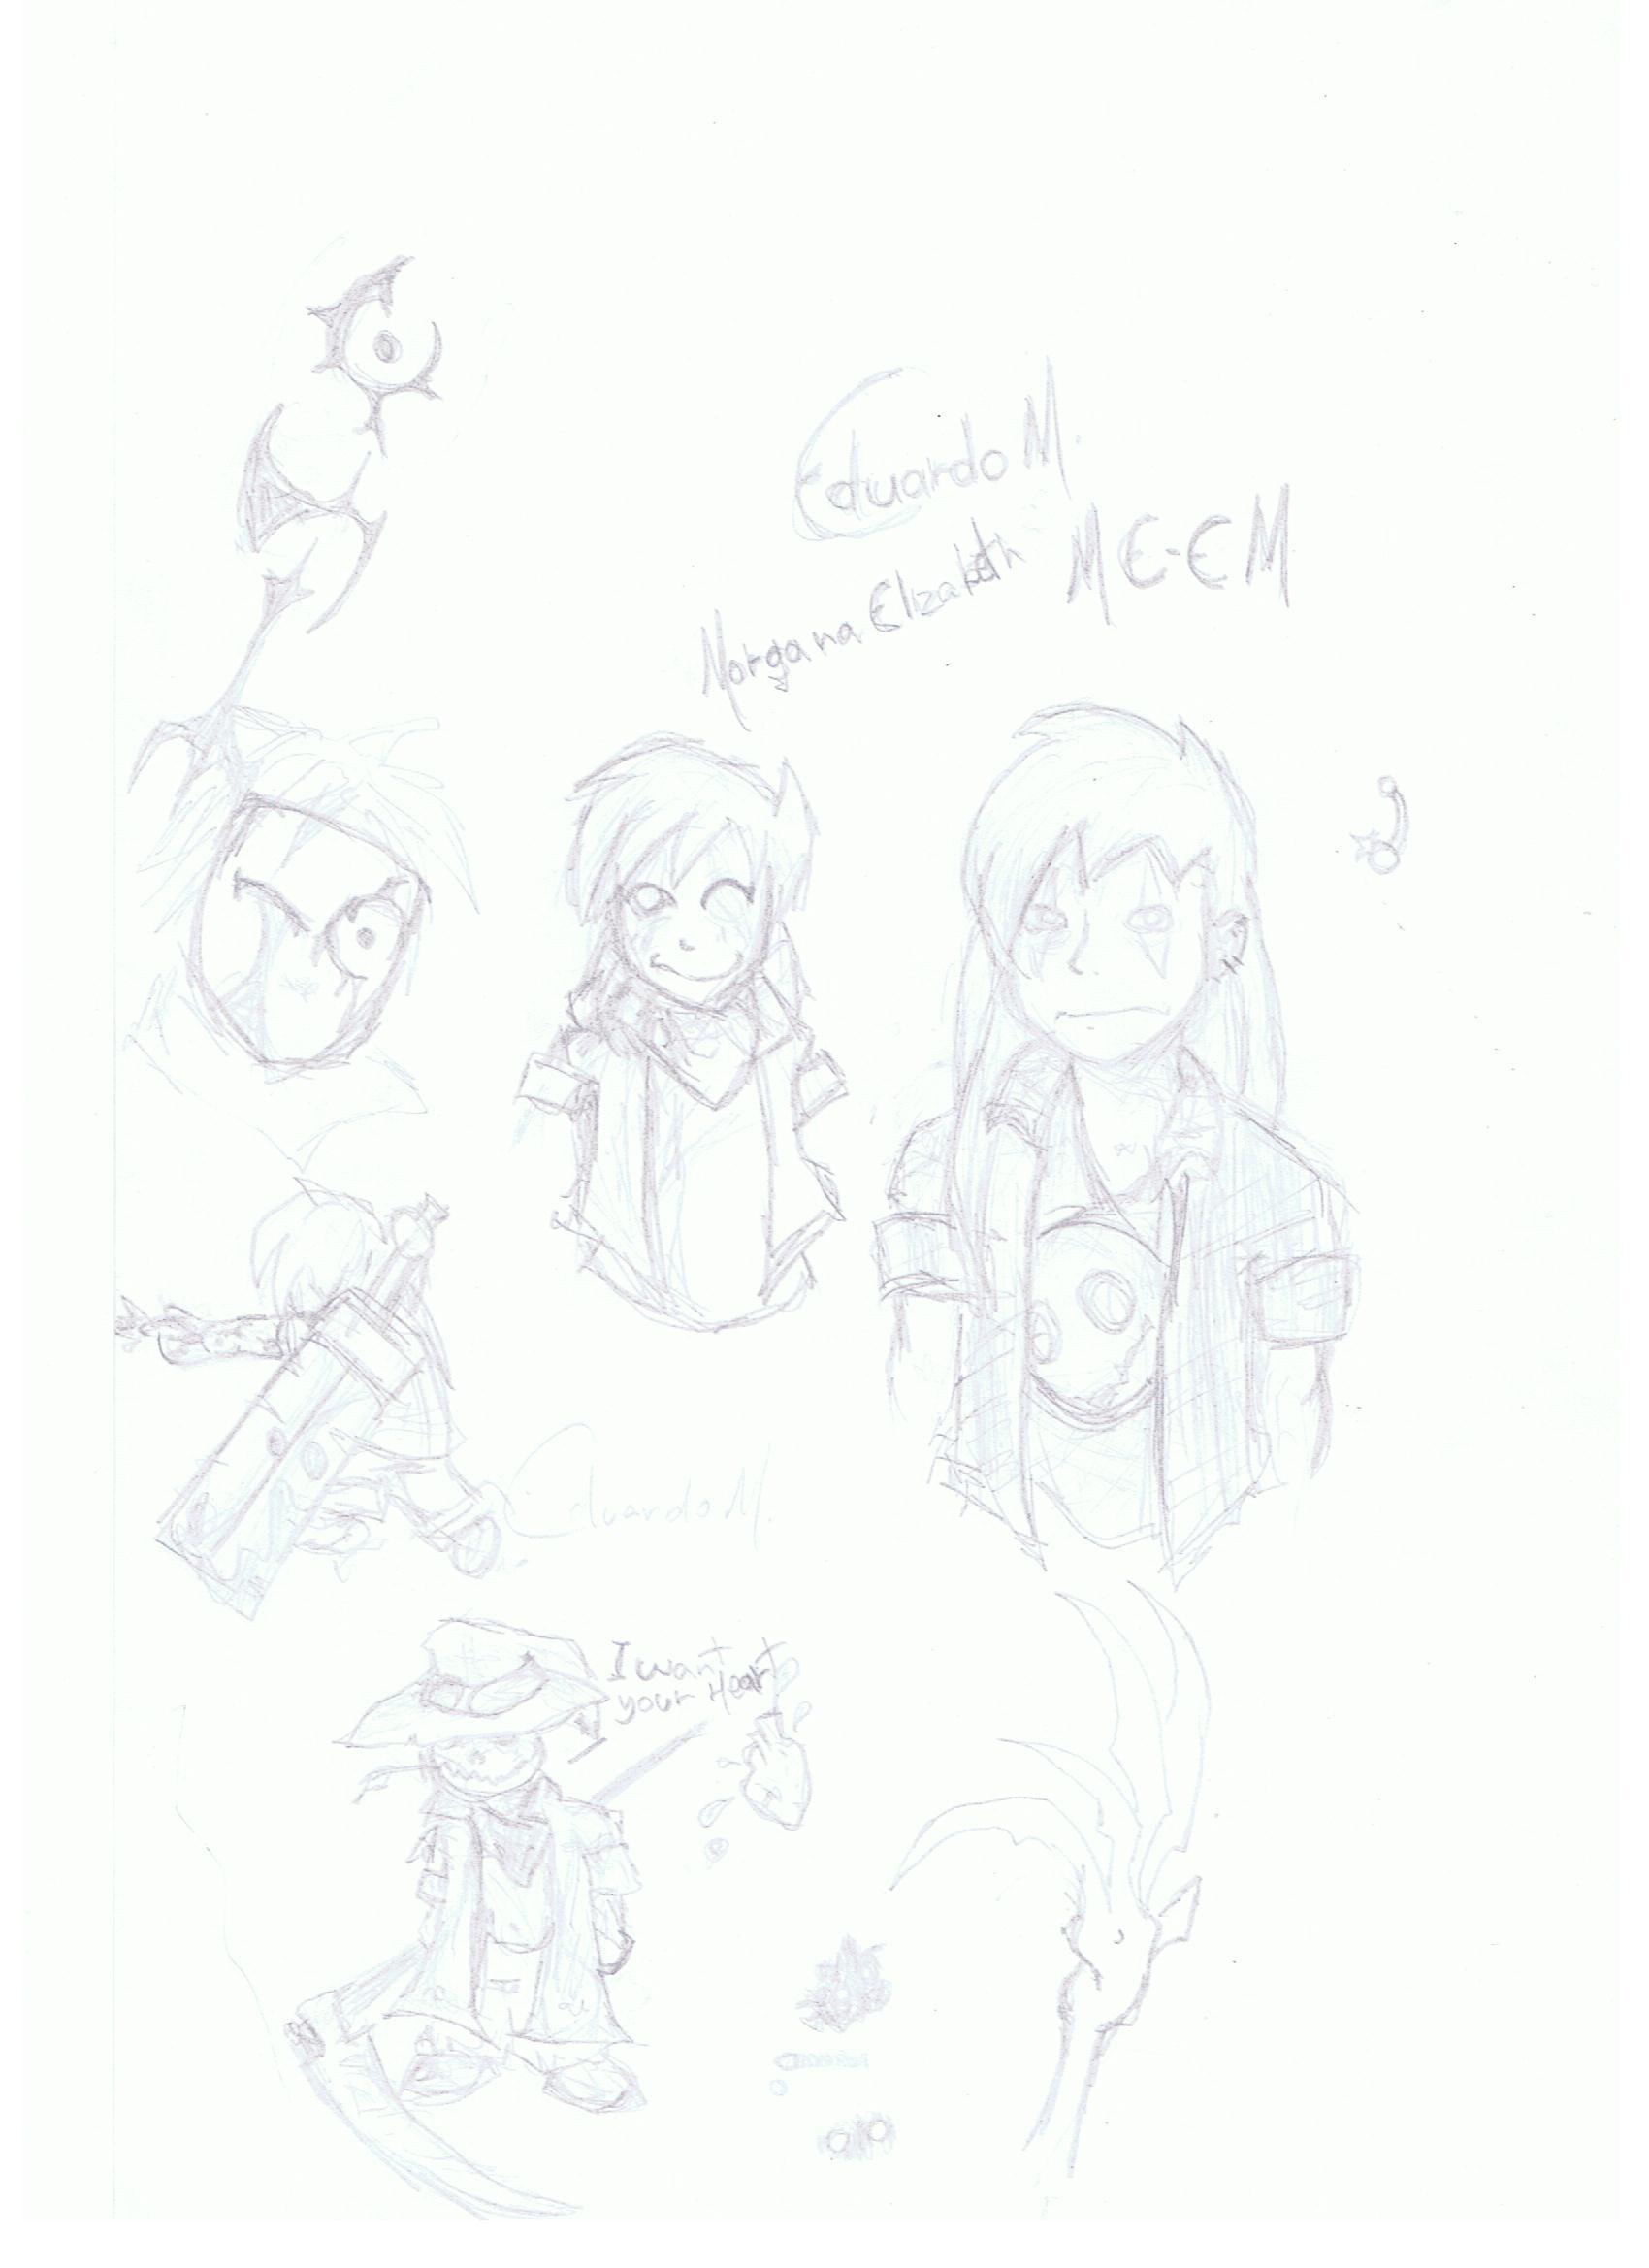 edy's sketch